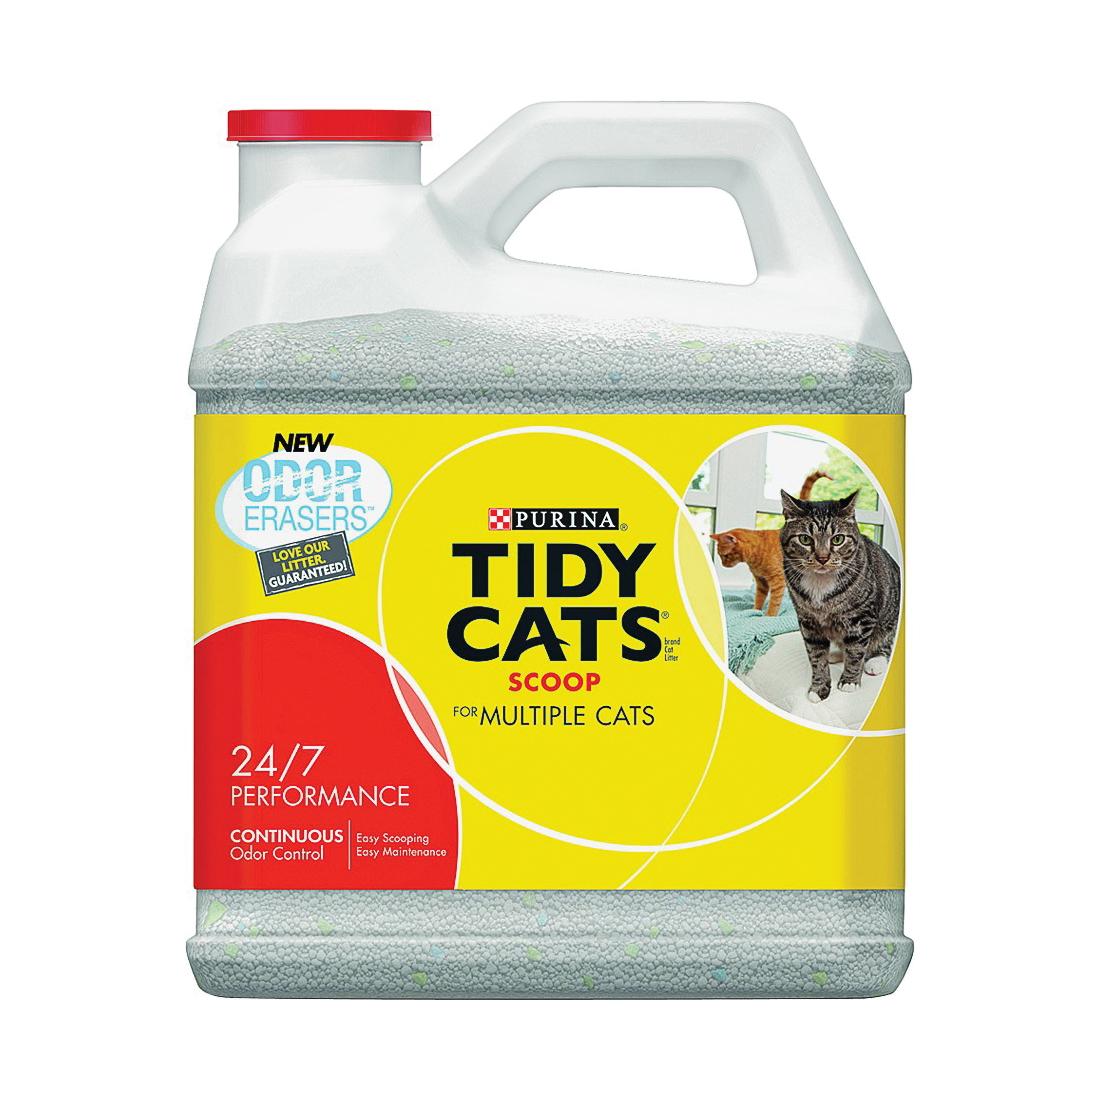 Picture of Tidy Cats 7023011614 Cat Litter, 14 lb Capacity, Gray/Tan, Granular, Jug